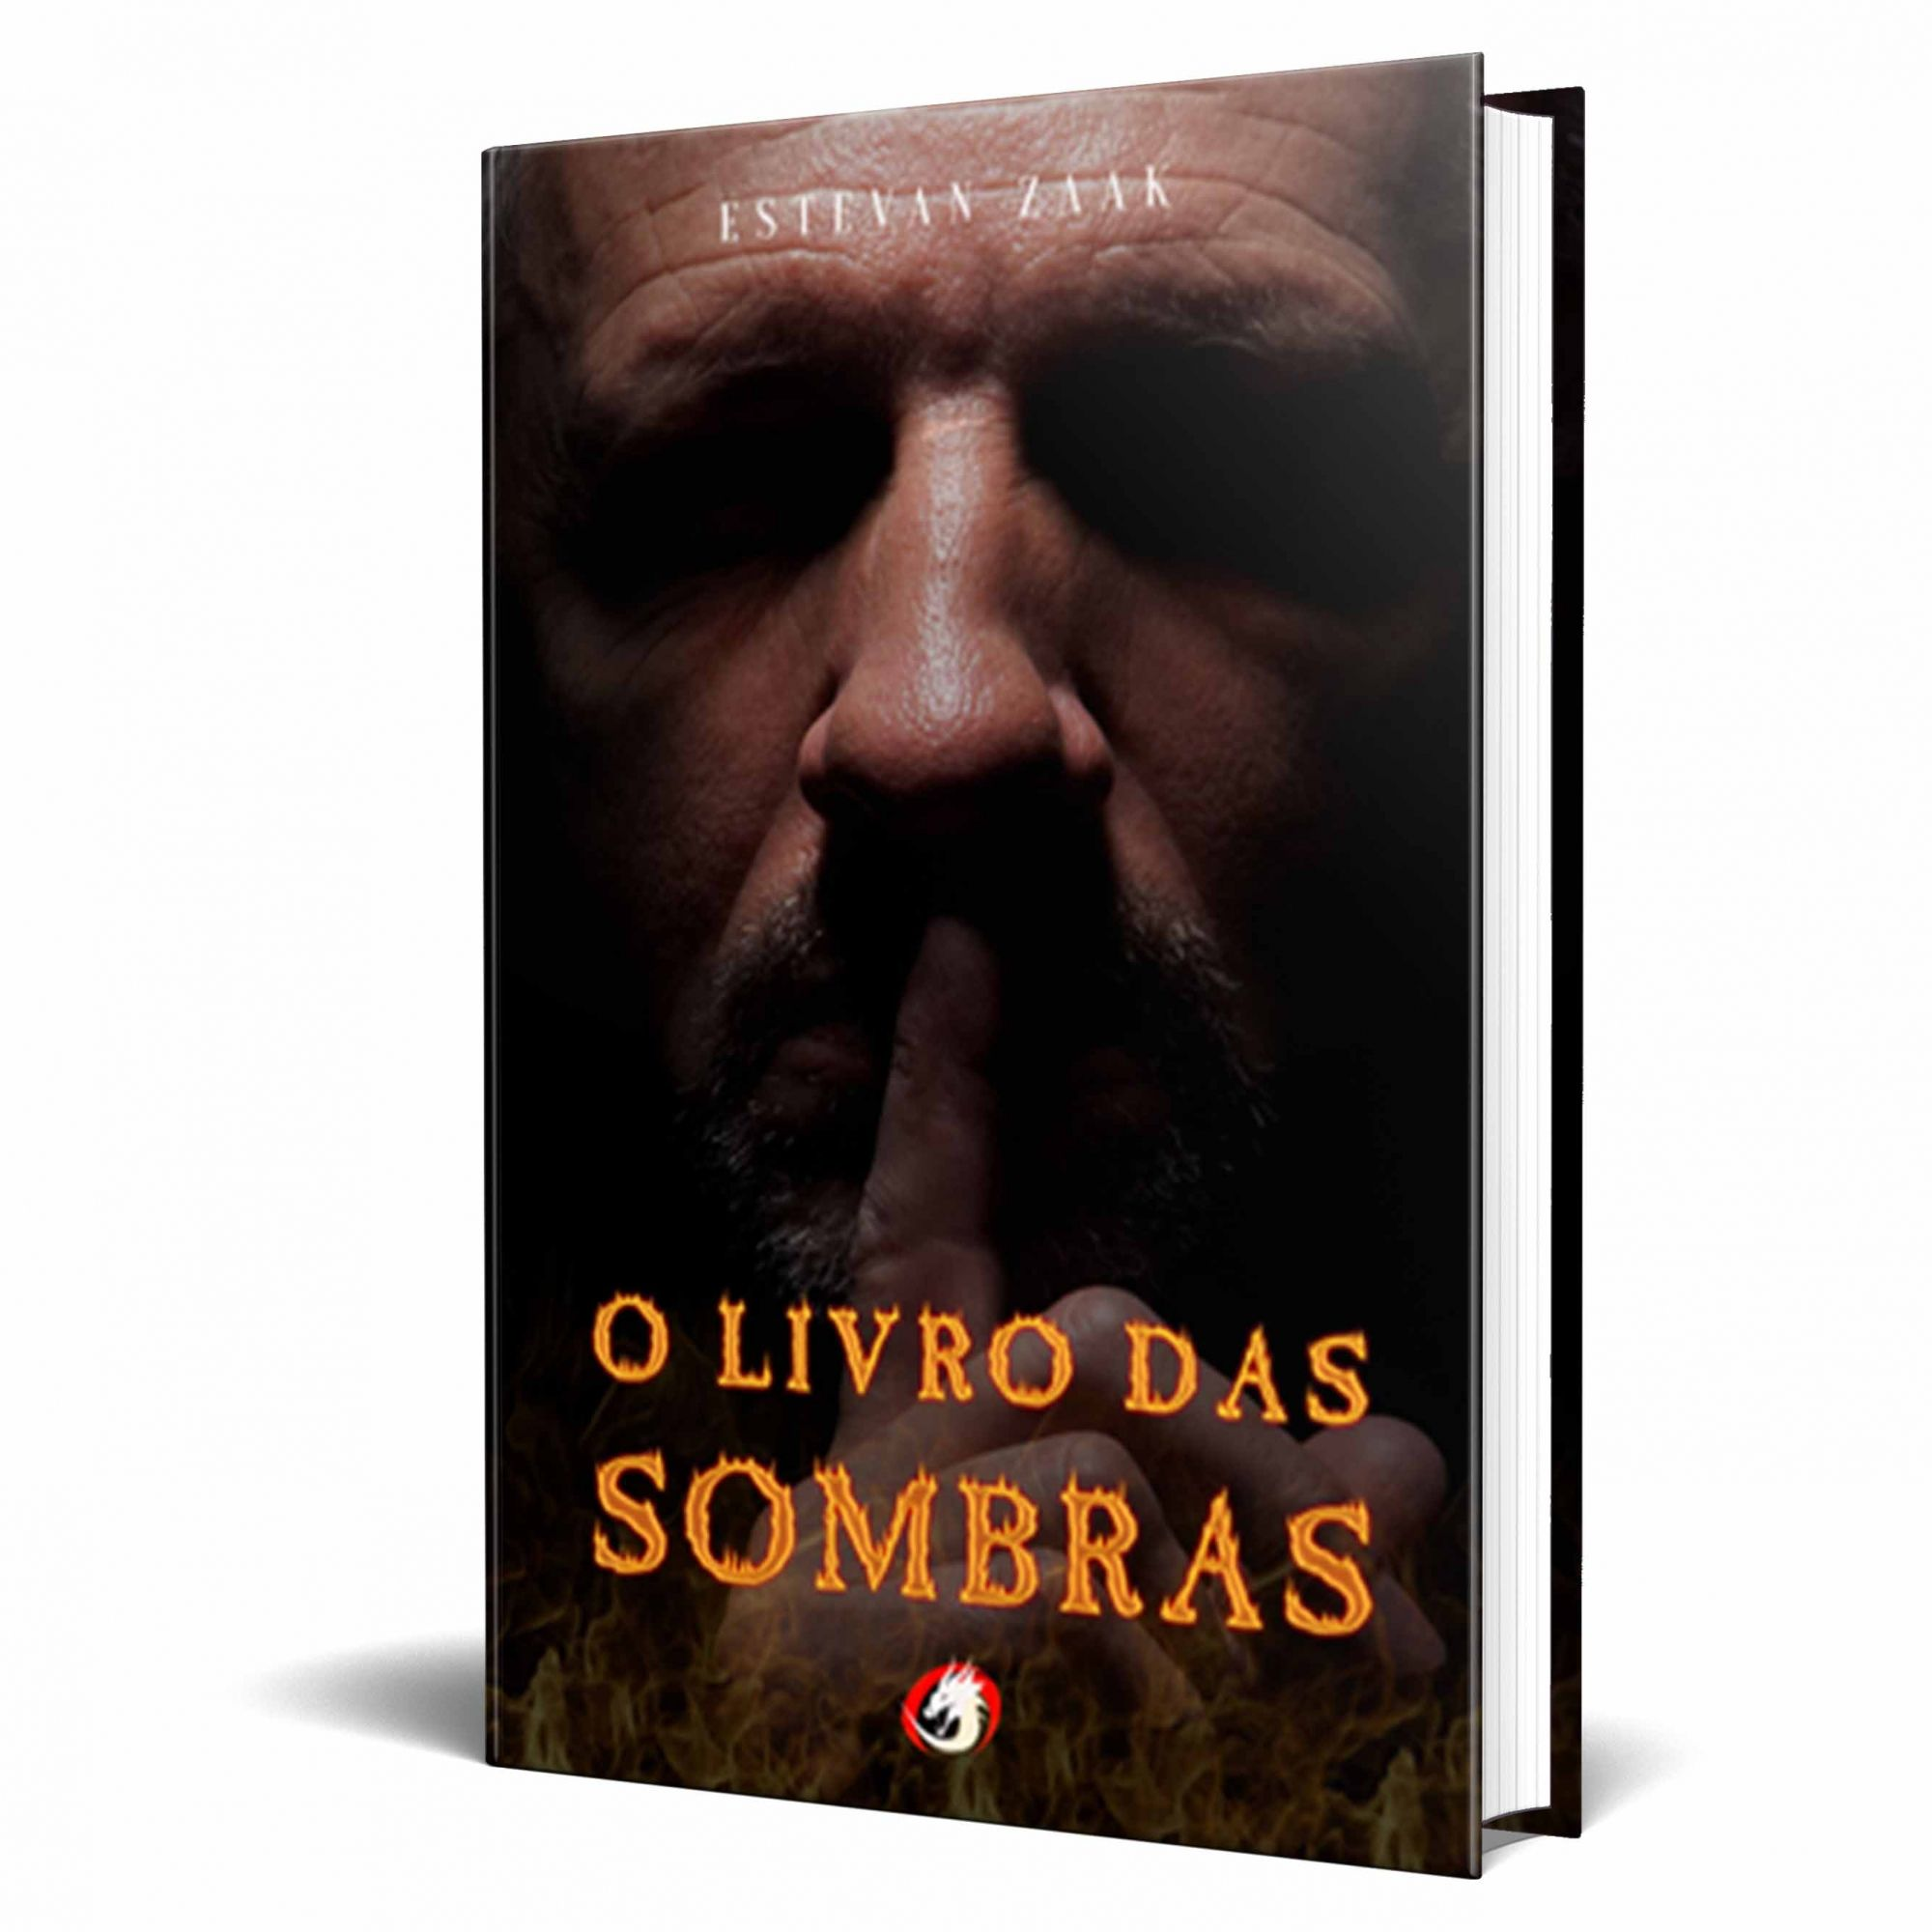 Livro das Sombras